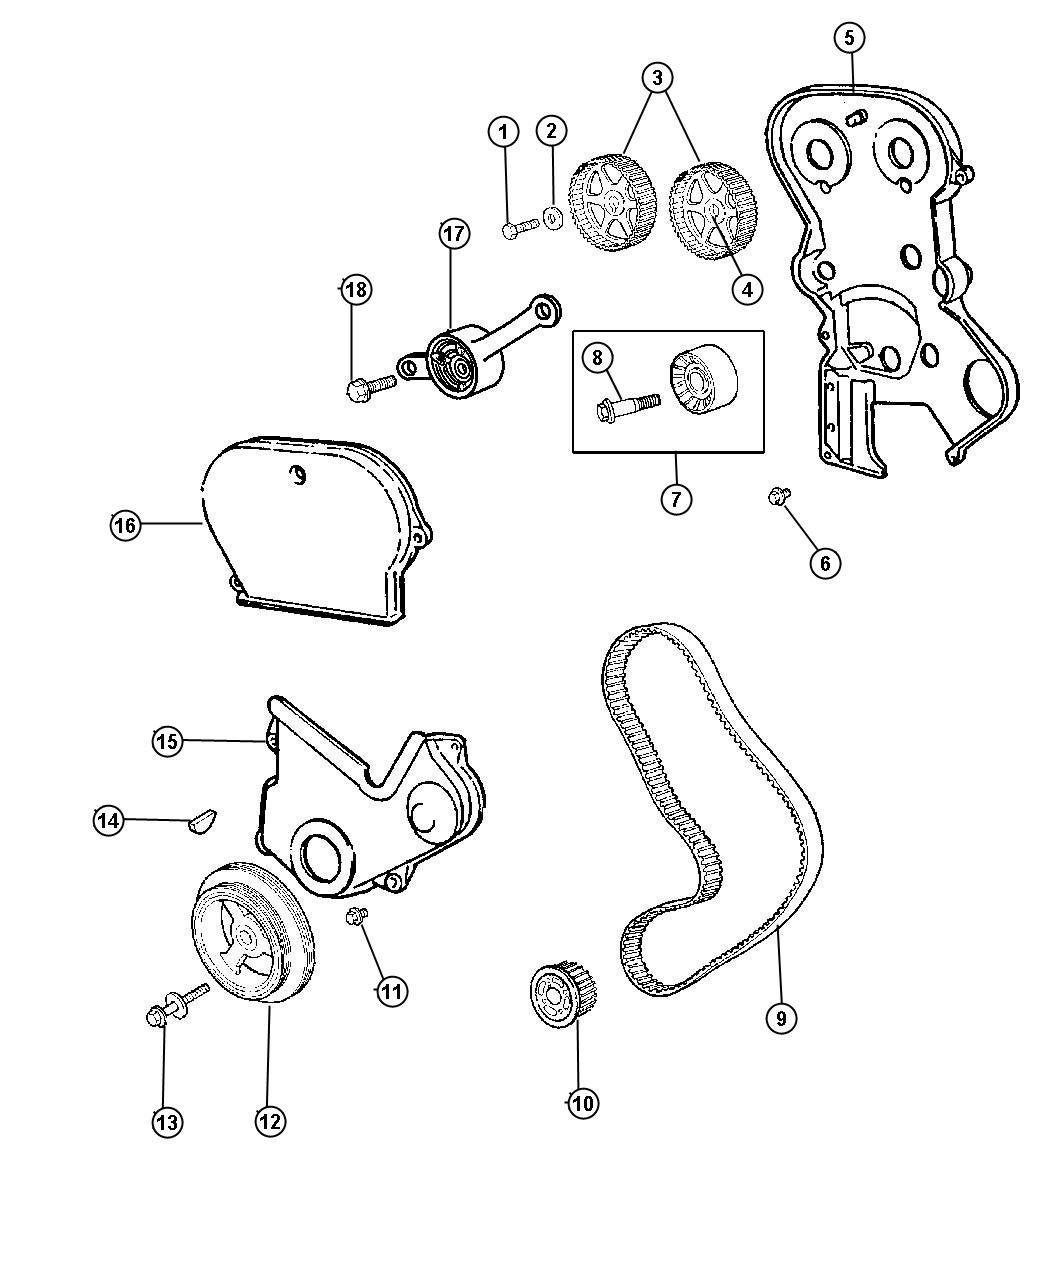 Dodge Intrepid Screw Hex Flange Head Tapping M4 8 X 1 59